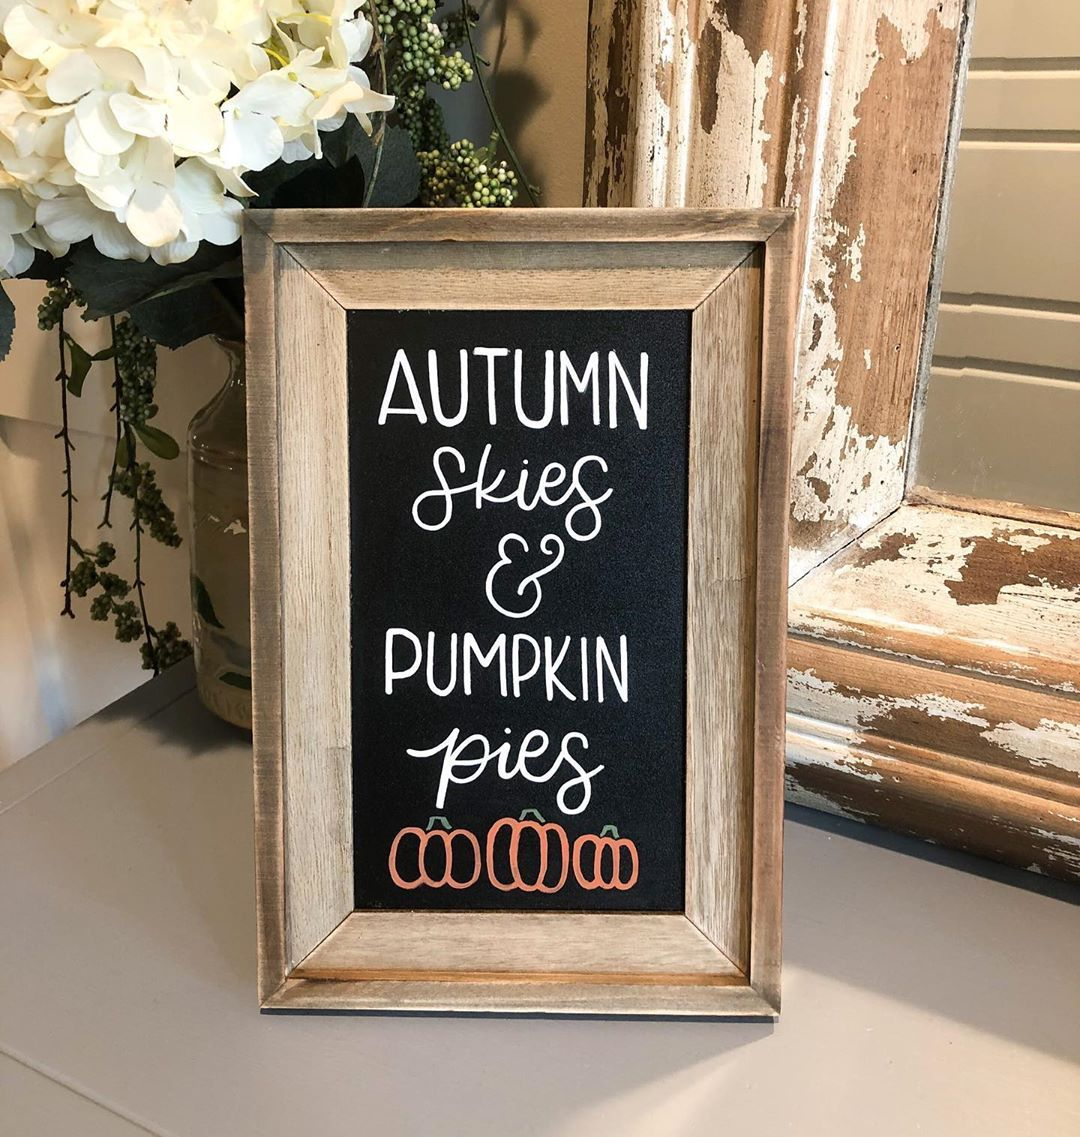 40++ Autumn skies and pumpkin pies ideas in 2021